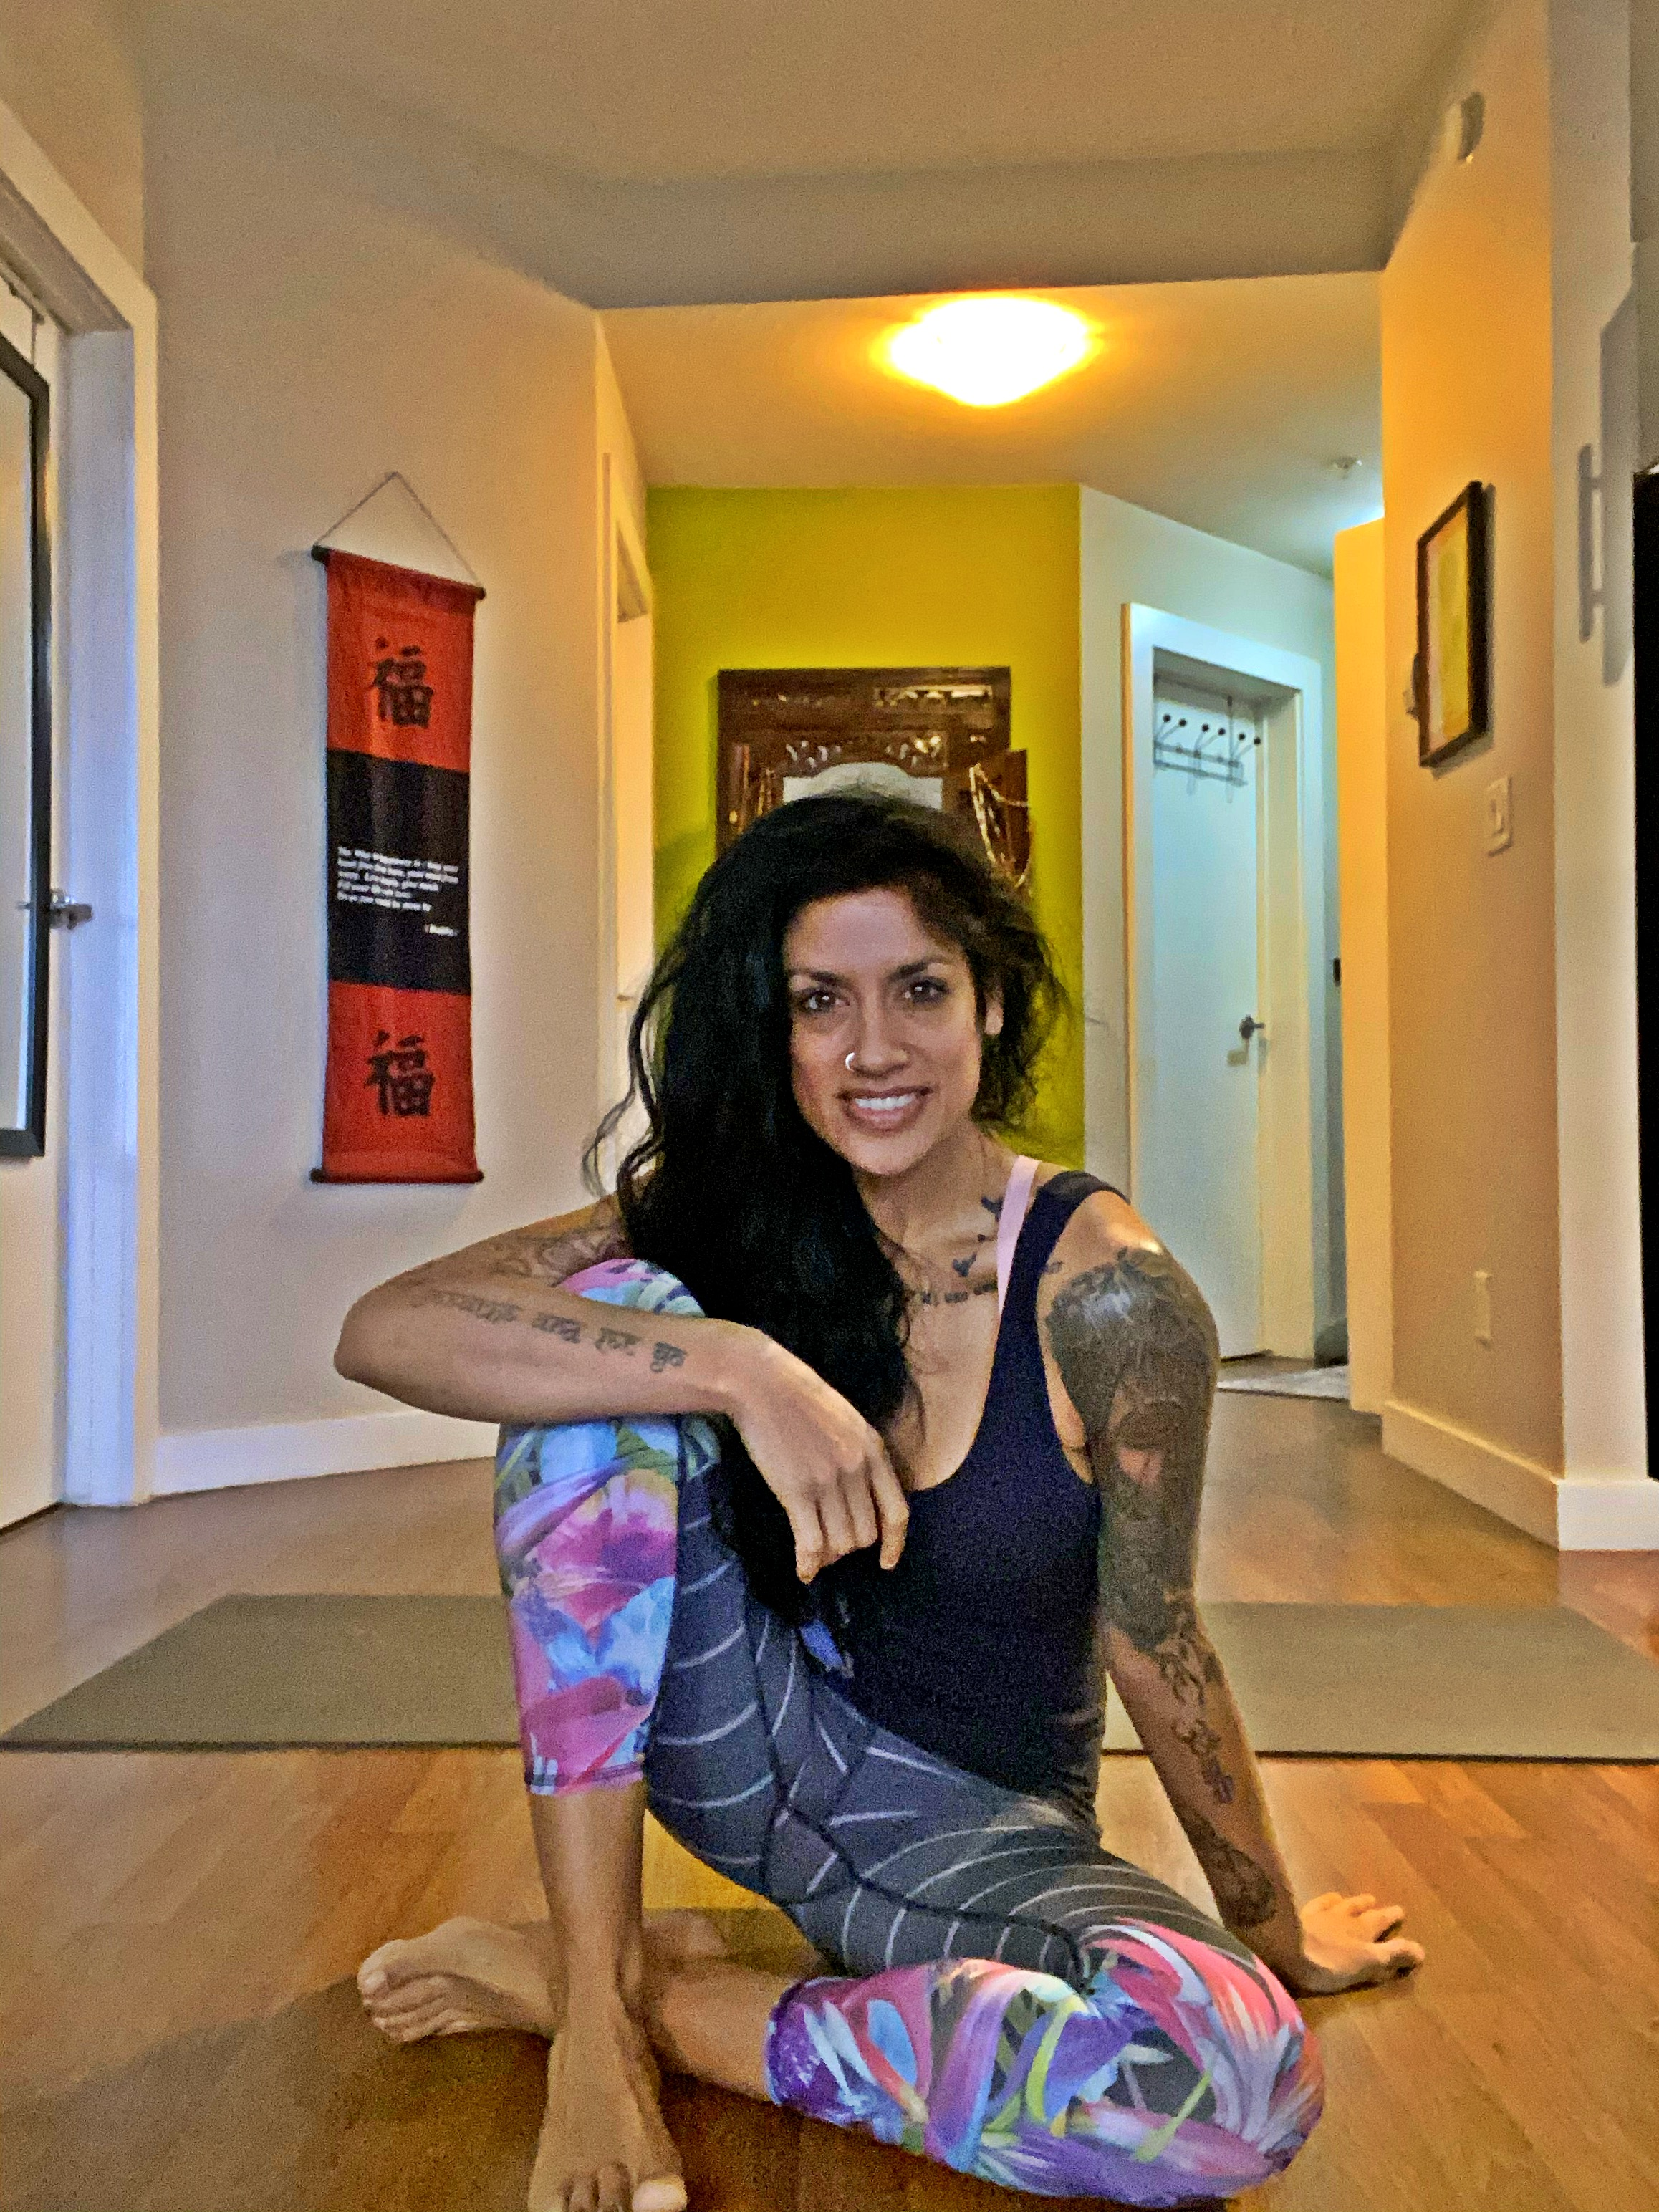 Becca Pati, Yoga, vinyasa, meditation, hatha, beginner, intermediate, advanced, flow, gentle, strength, core, workout,, stretching, runners,